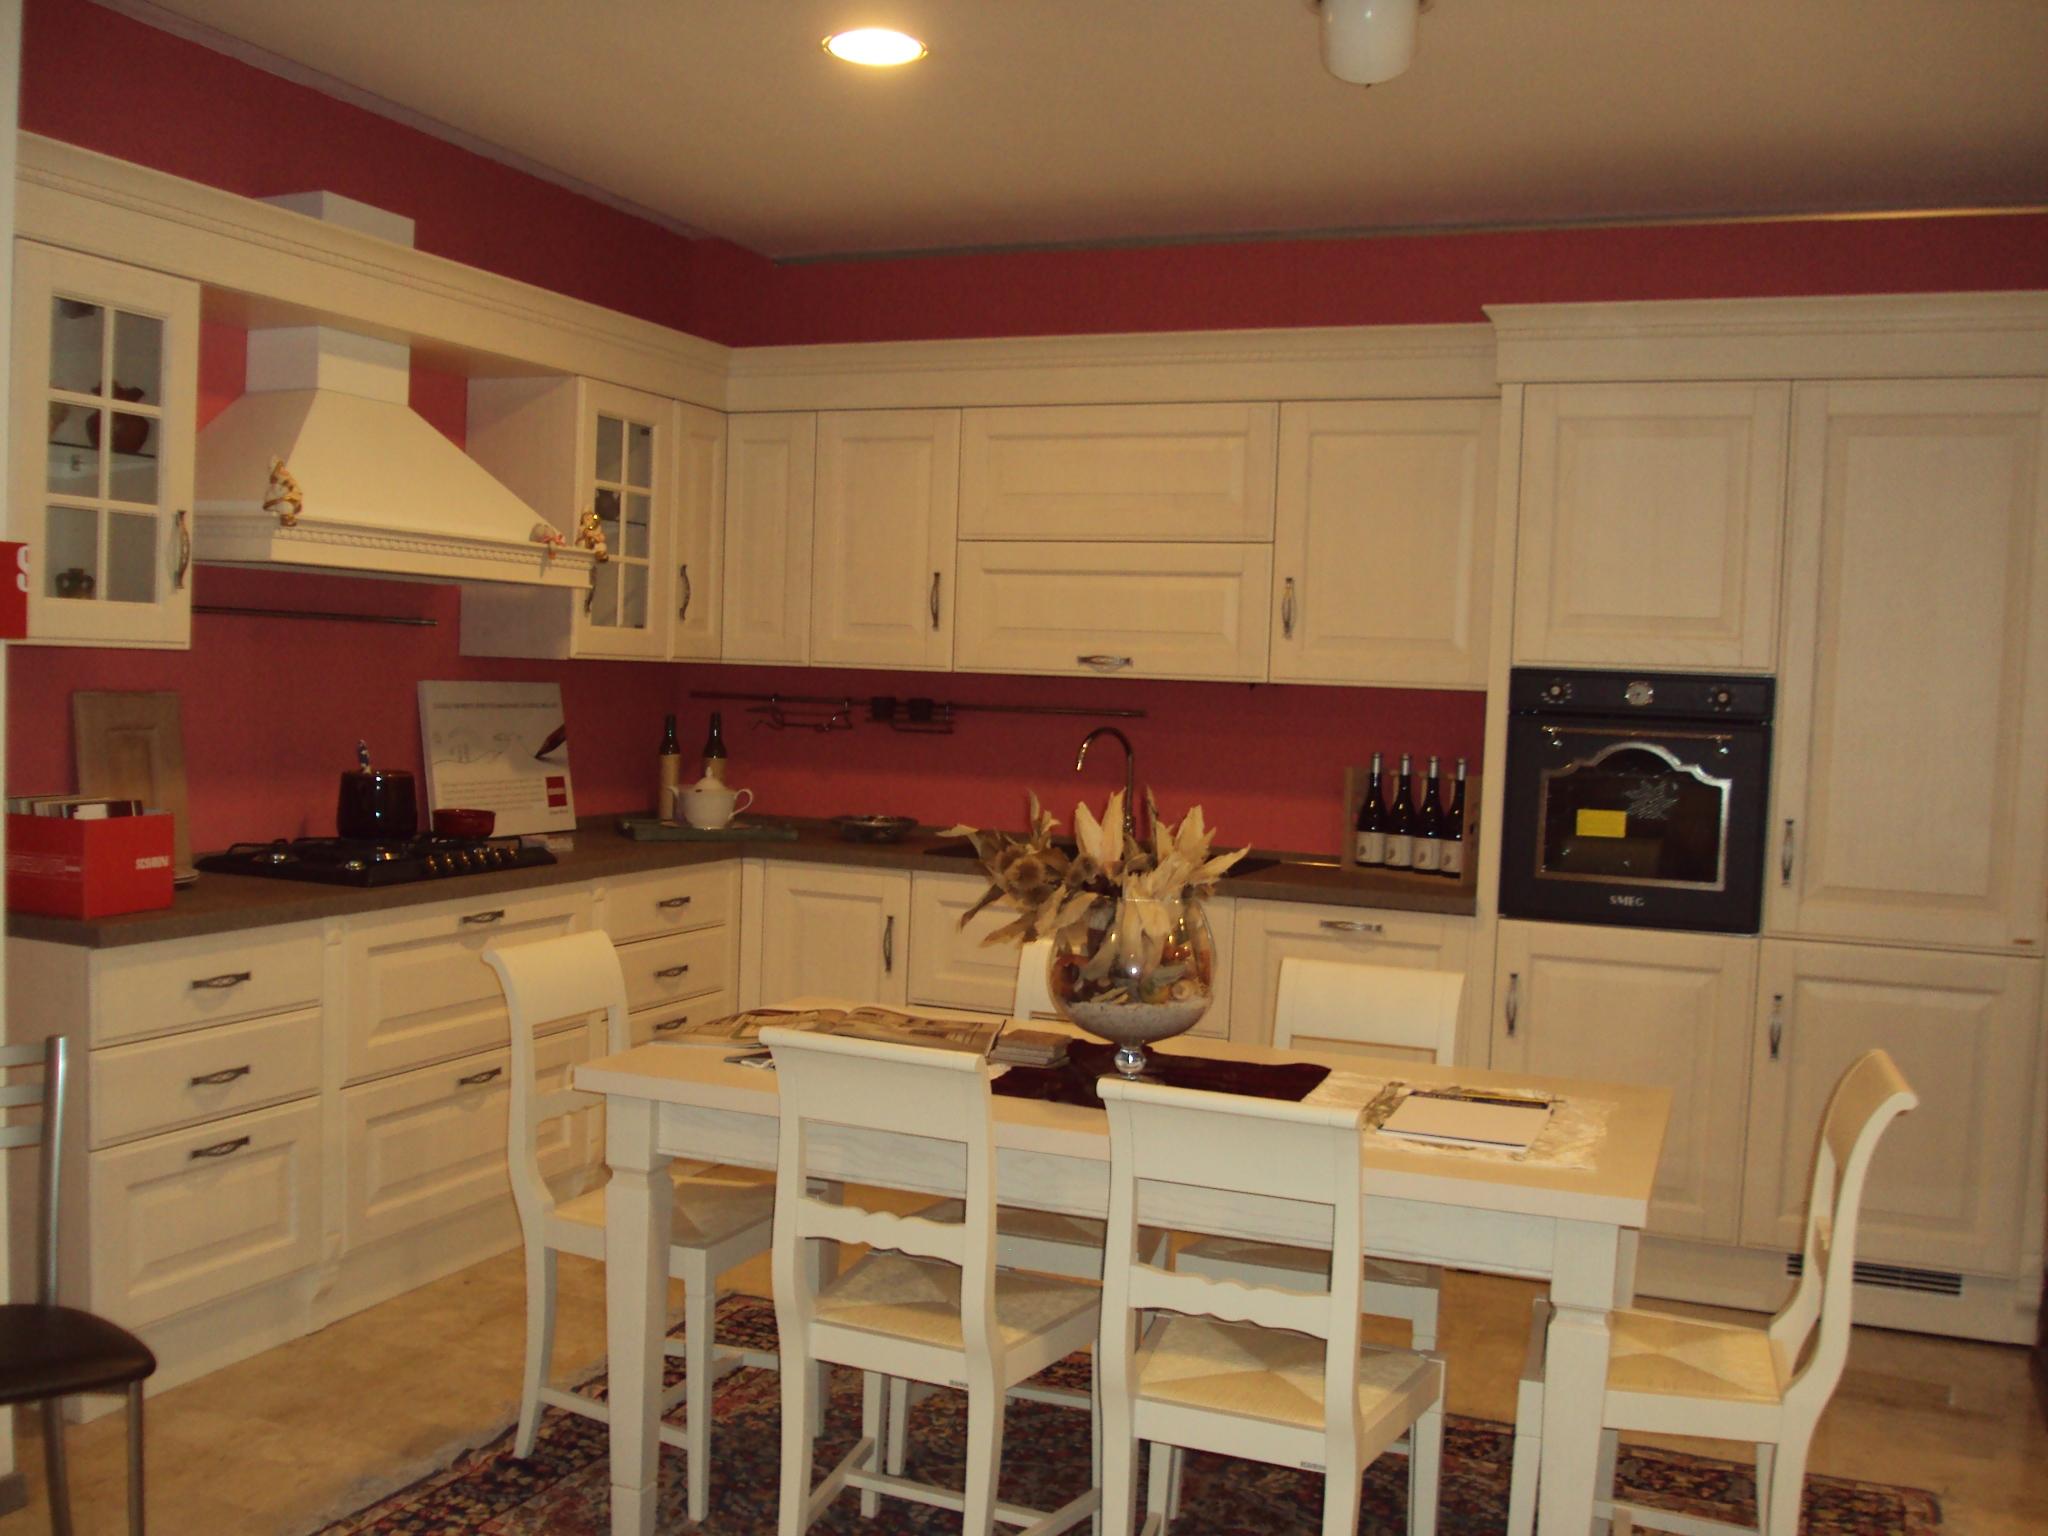 Stunning Lavelli Cucina Smeg Gallery - Home Interior Ideas ...